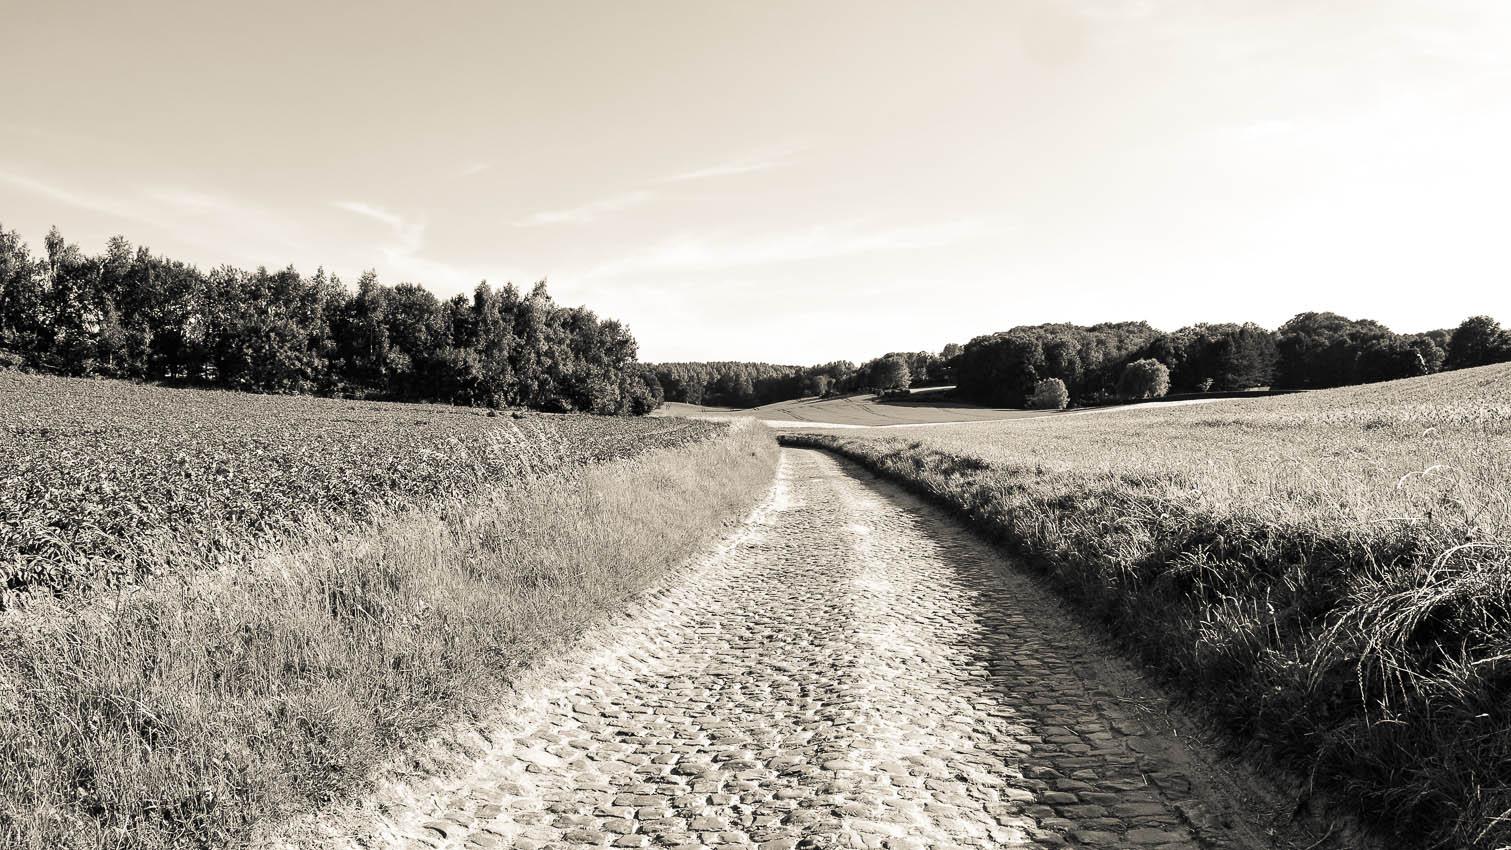 05-route-paysage-location-decors-film-cinema-photo-belgium-bruxelles